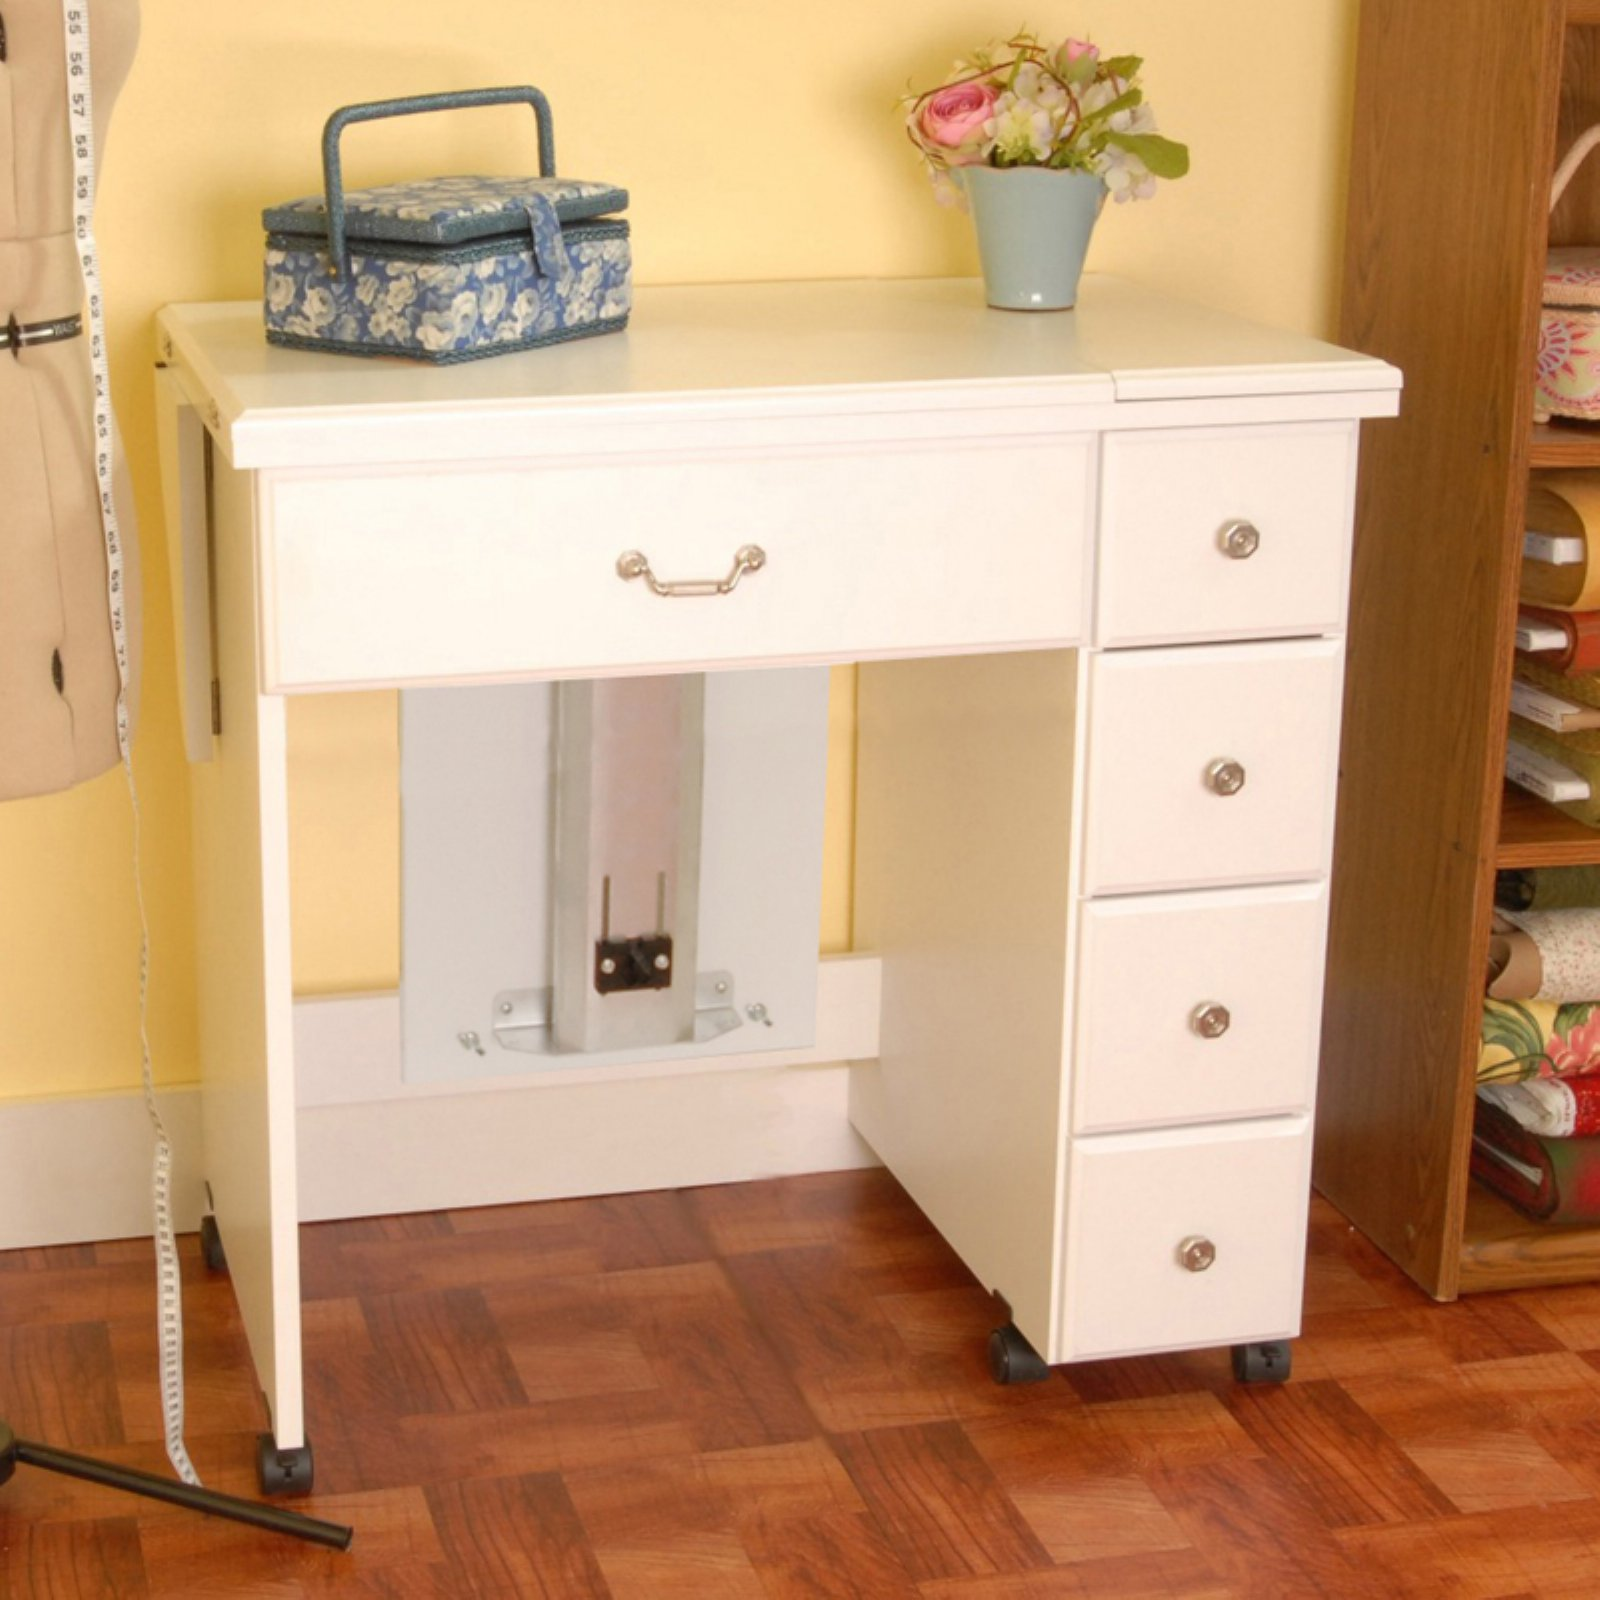 Arrow Auntie Em Sewing Cabinet with Air lift mechanism - Walmart.com